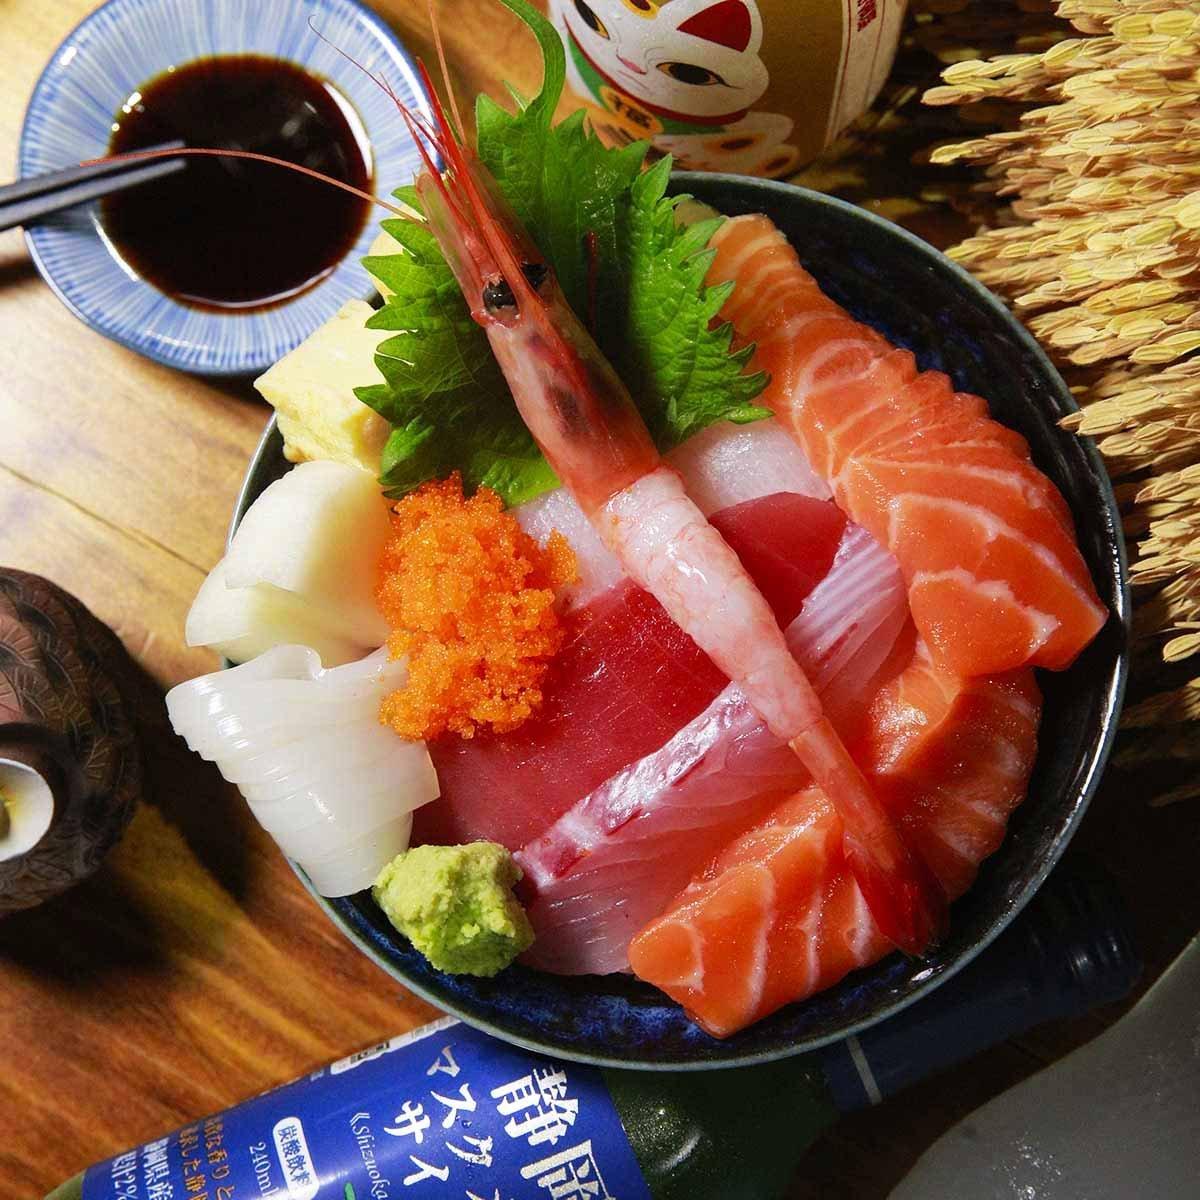 //cdn.funnow.com.tw/images/oblog/大黑居酒食堂_海鮮丼飯_75db3b.jpg